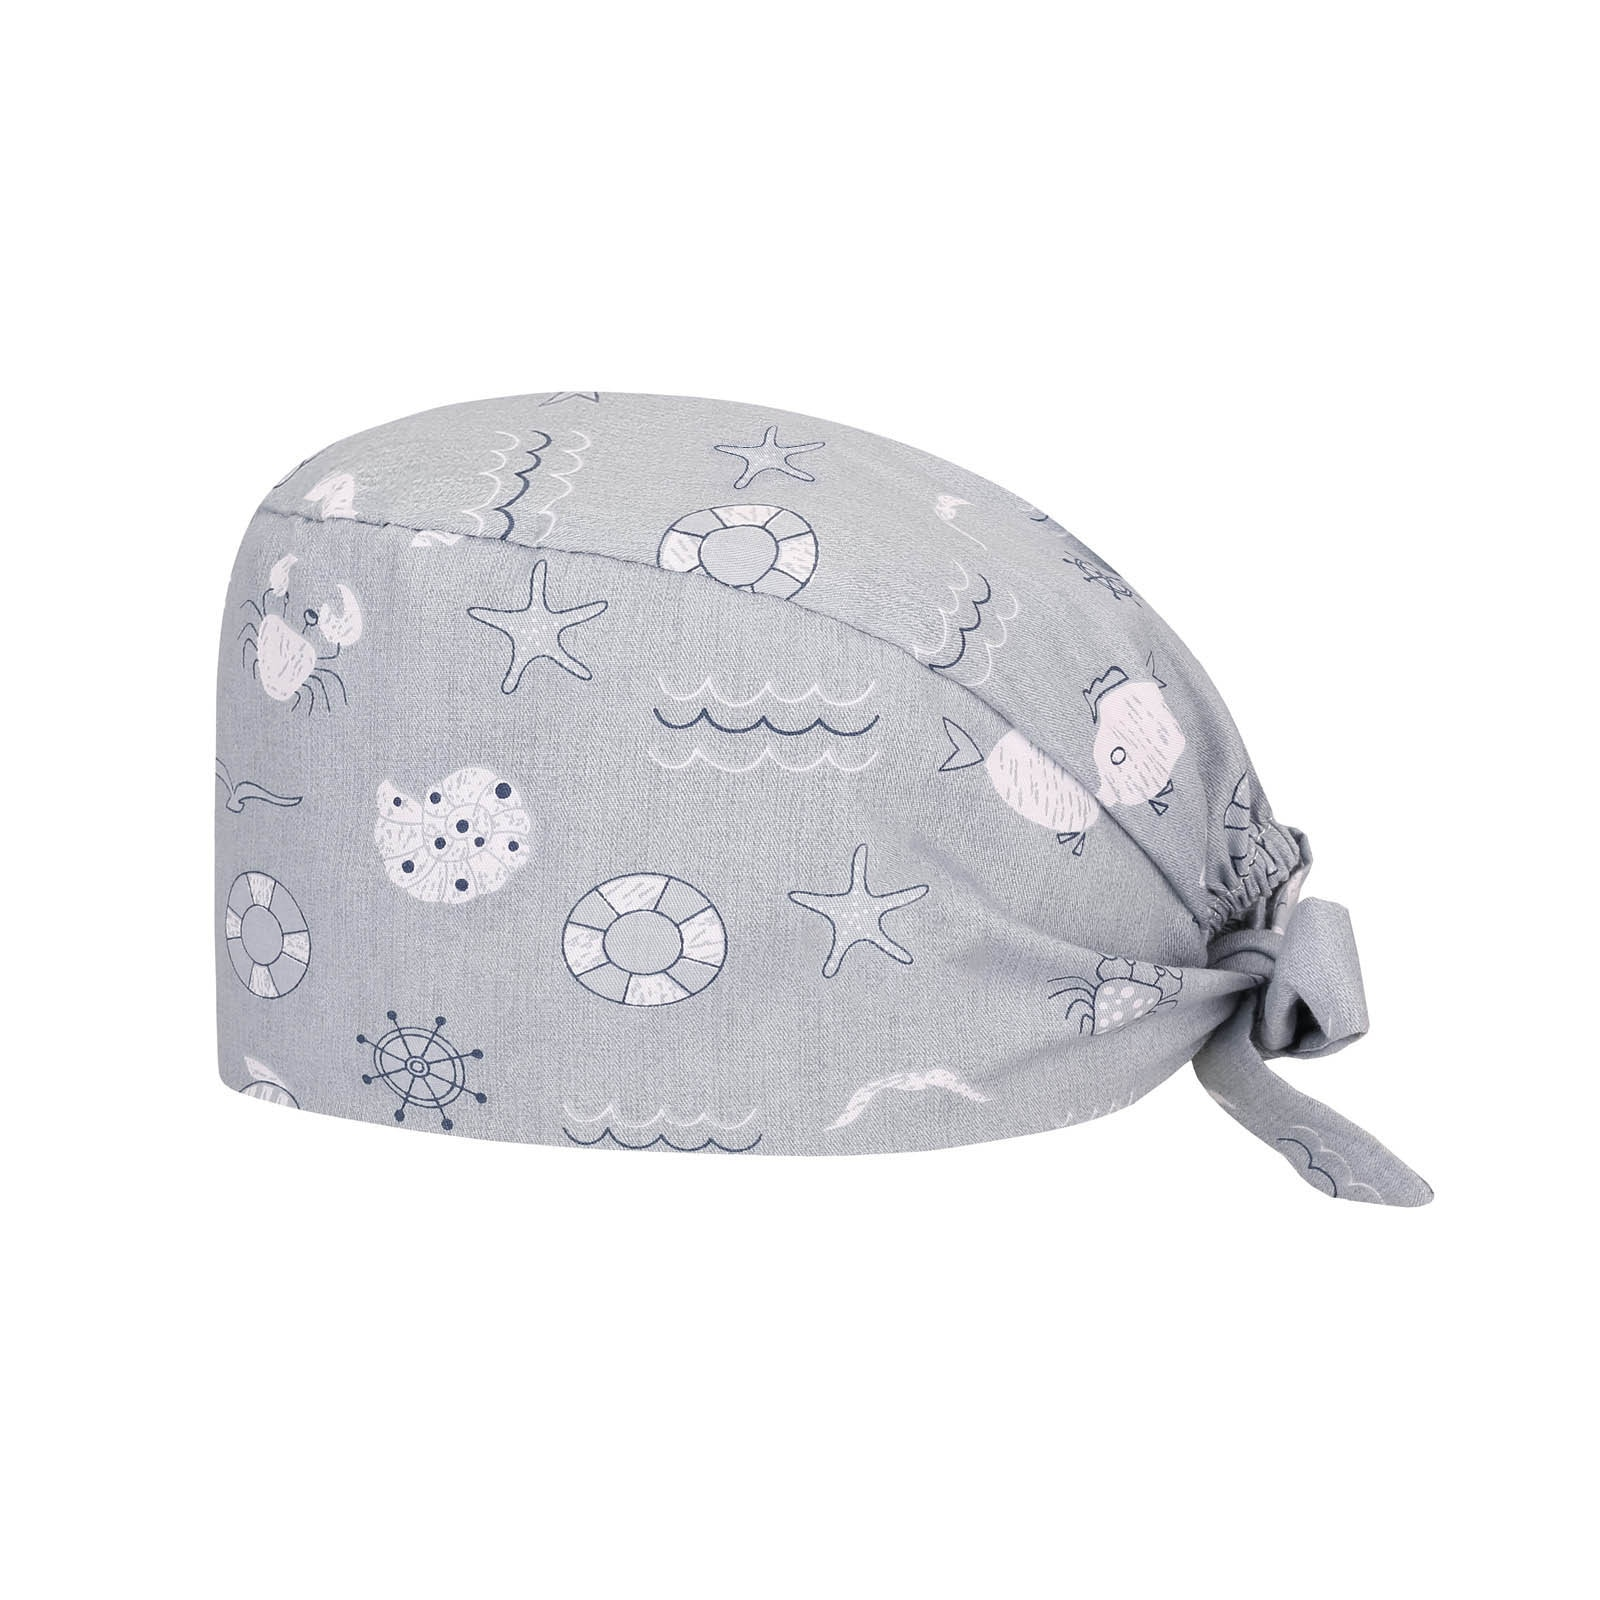 Adjustable Elastic Button Women Hat Cartoon Print Cap Health Service Scrubs Caps Pet Beauty Work Hat